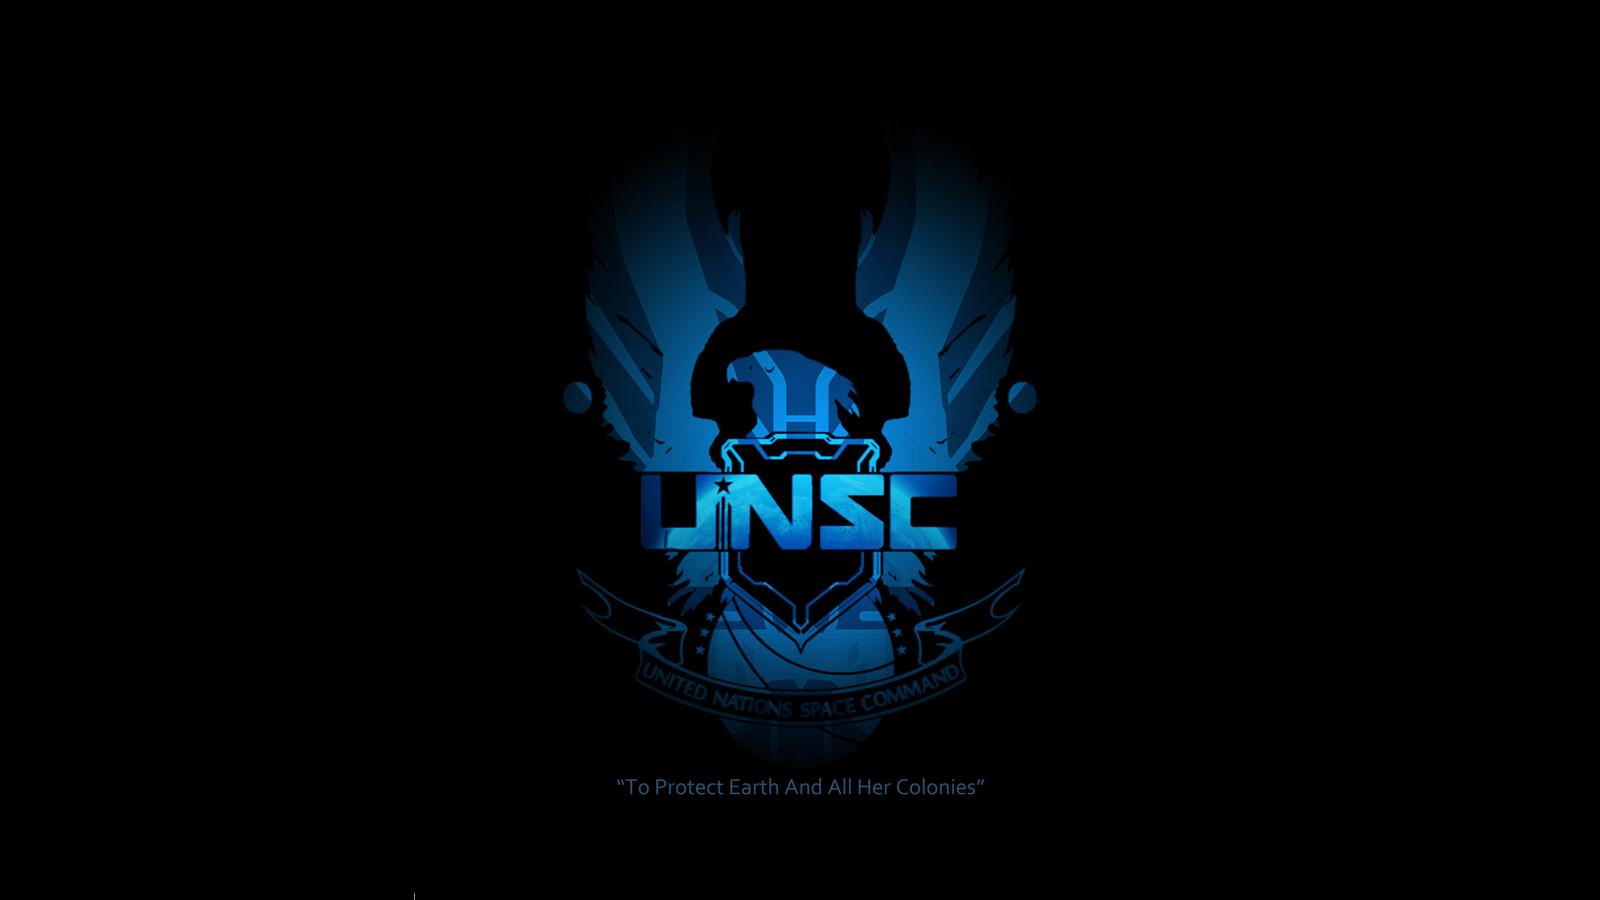 UNSC Halo Tabletop Cover Wallpaper by Vorkedlarfleeze on deviantART 1600x900